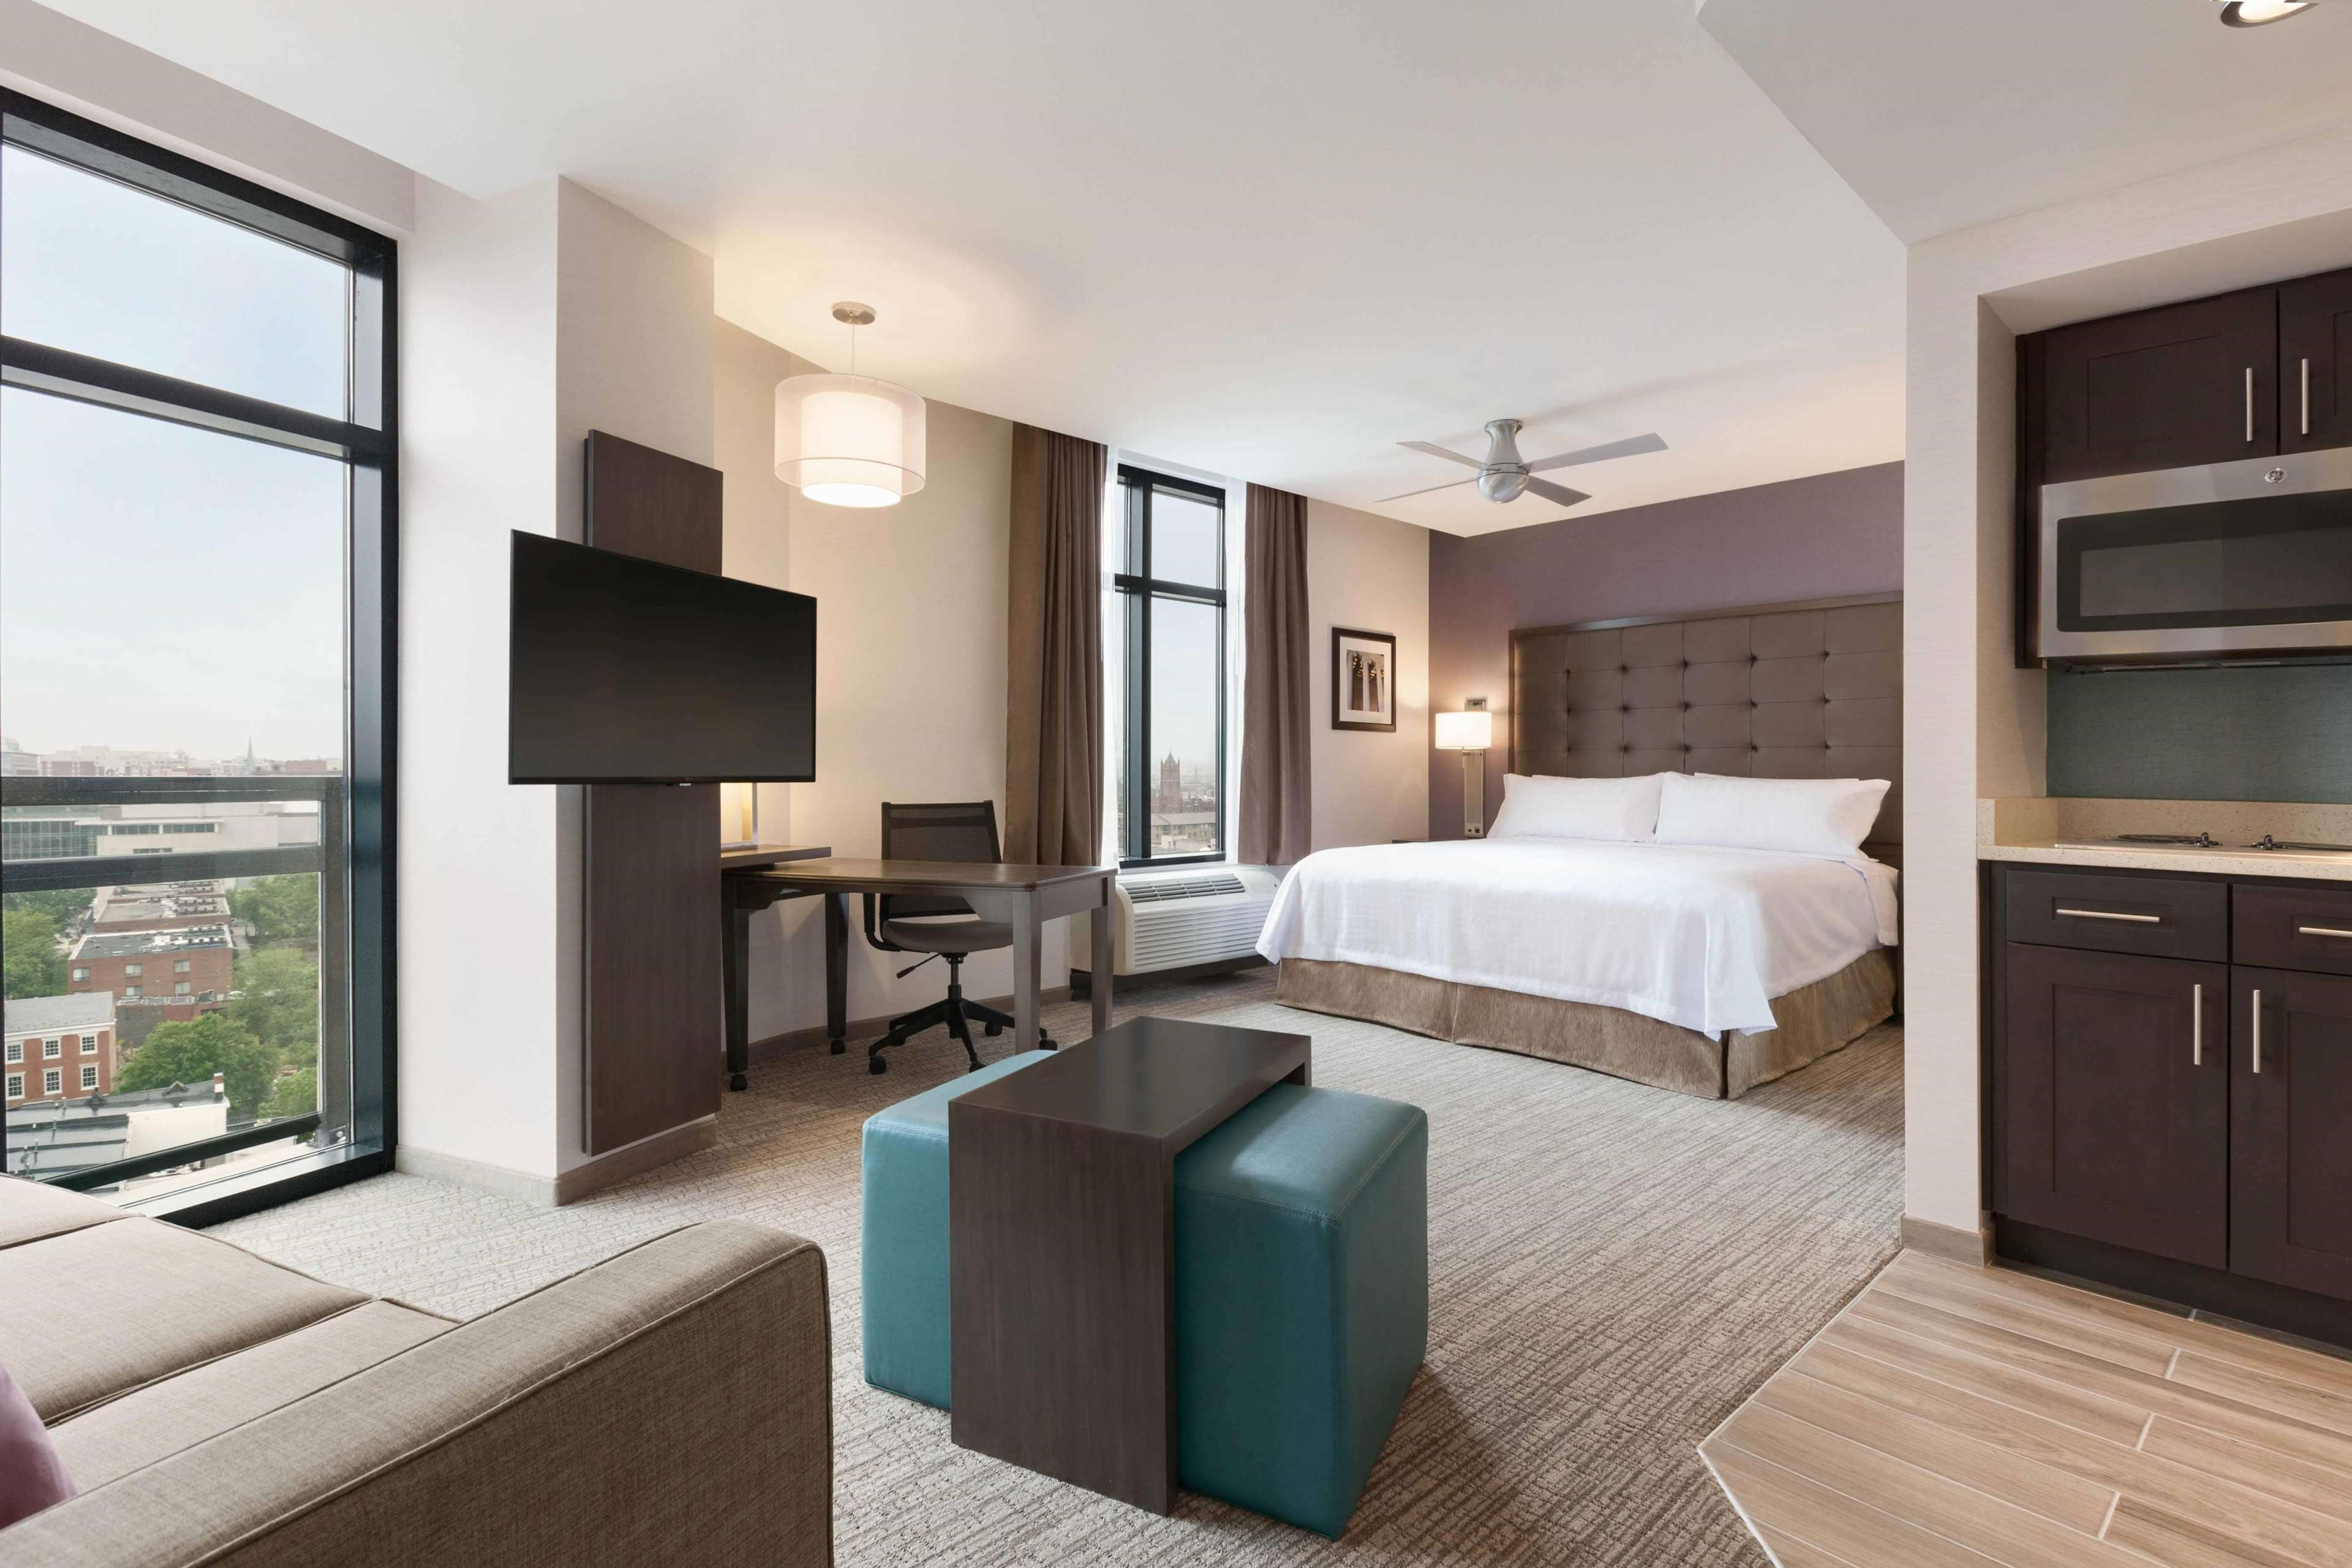 Homewood Suites by Hilton Washington DC Convention Center image 16